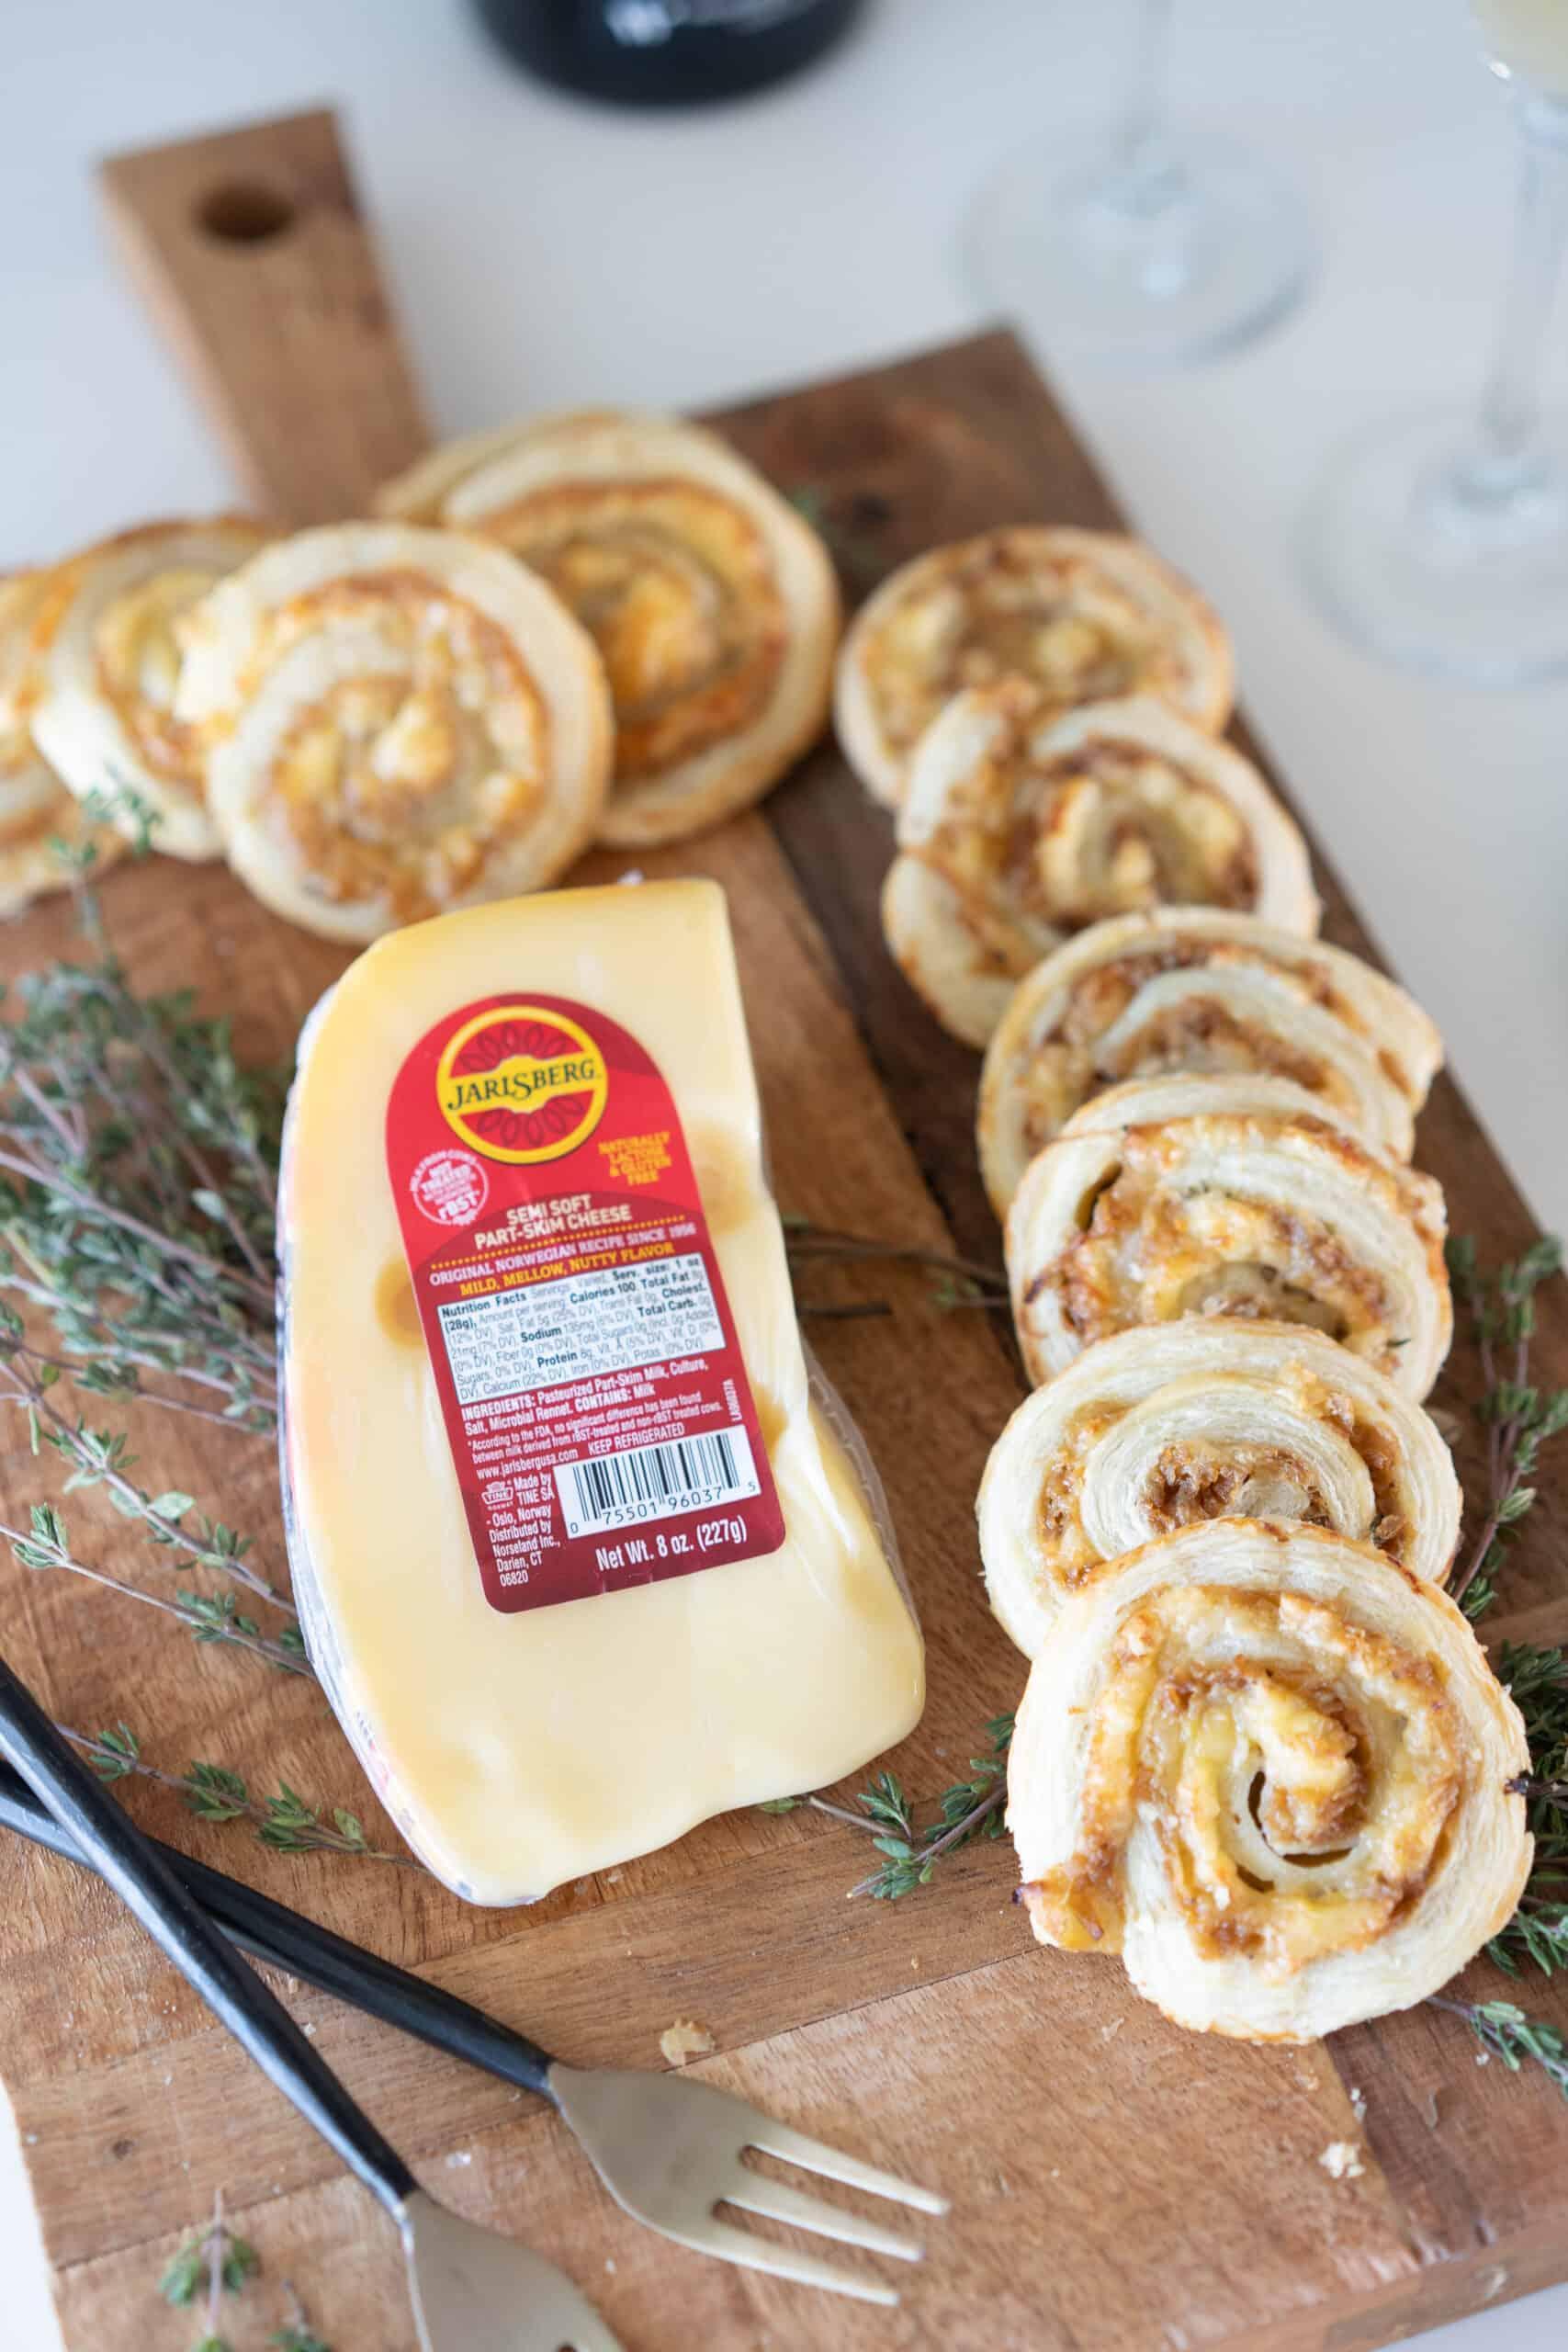 Jarlsberg Cheese block on a cutting board